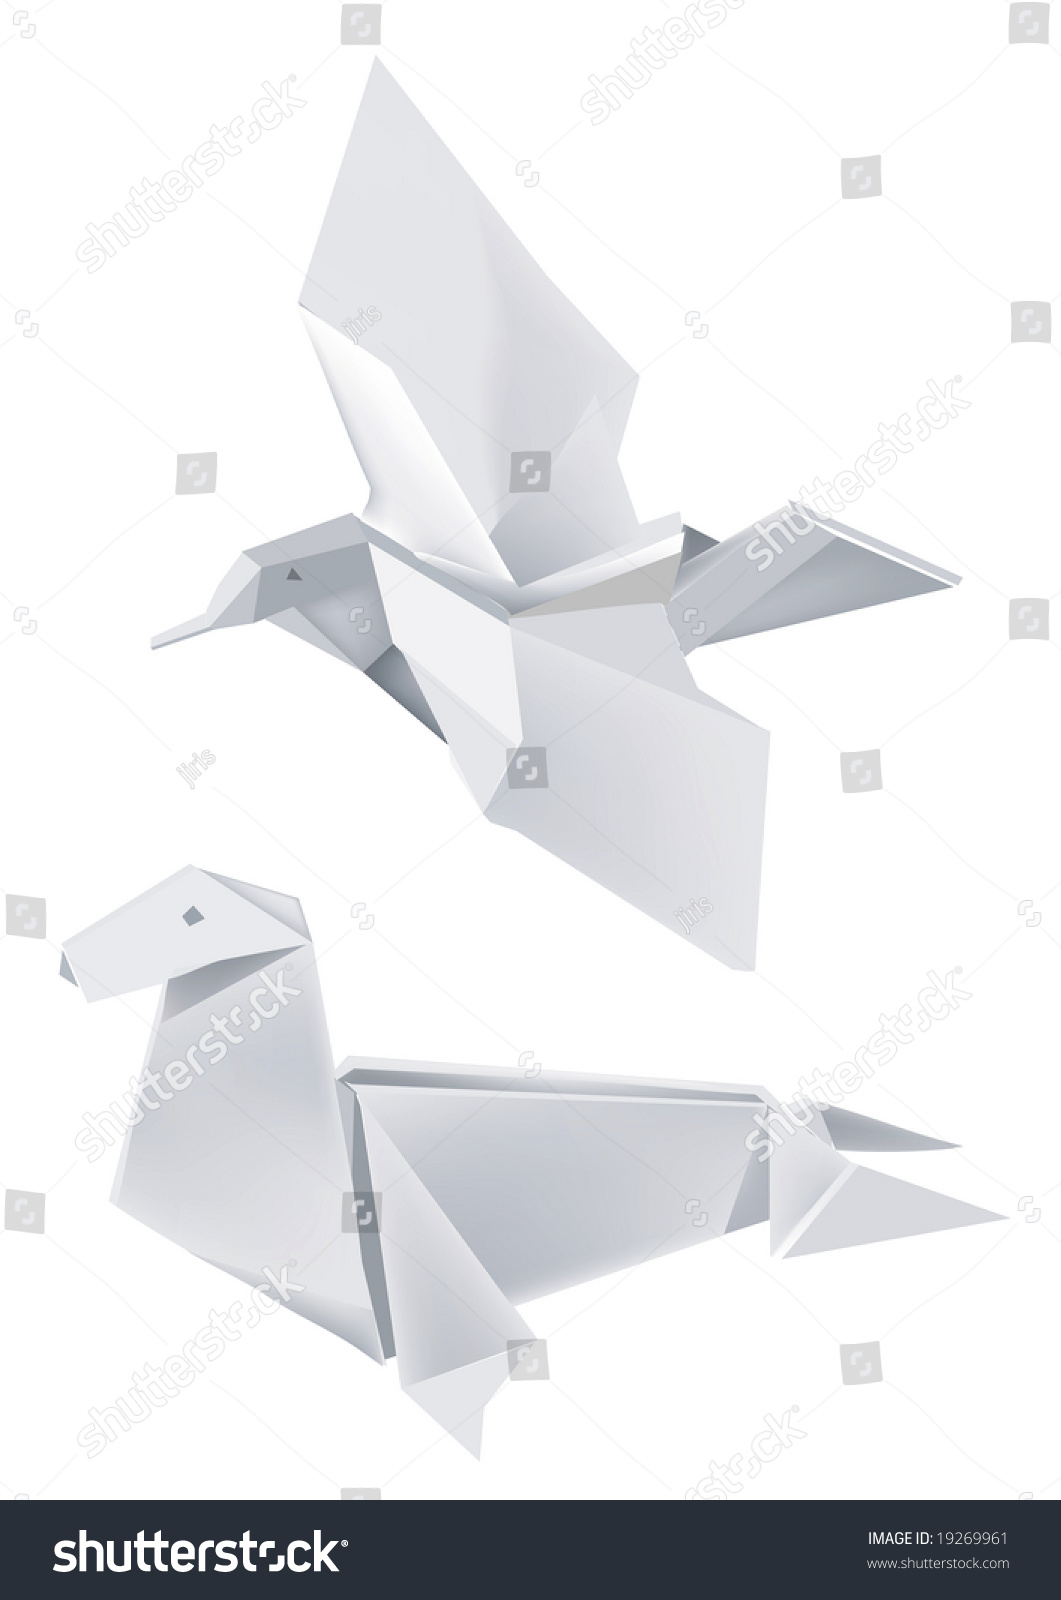 Illustration folded paper models seal bird stock vector 19269961 illustration of folded paper models seal and bird on white background vector illustration jeuxipadfo Gallery